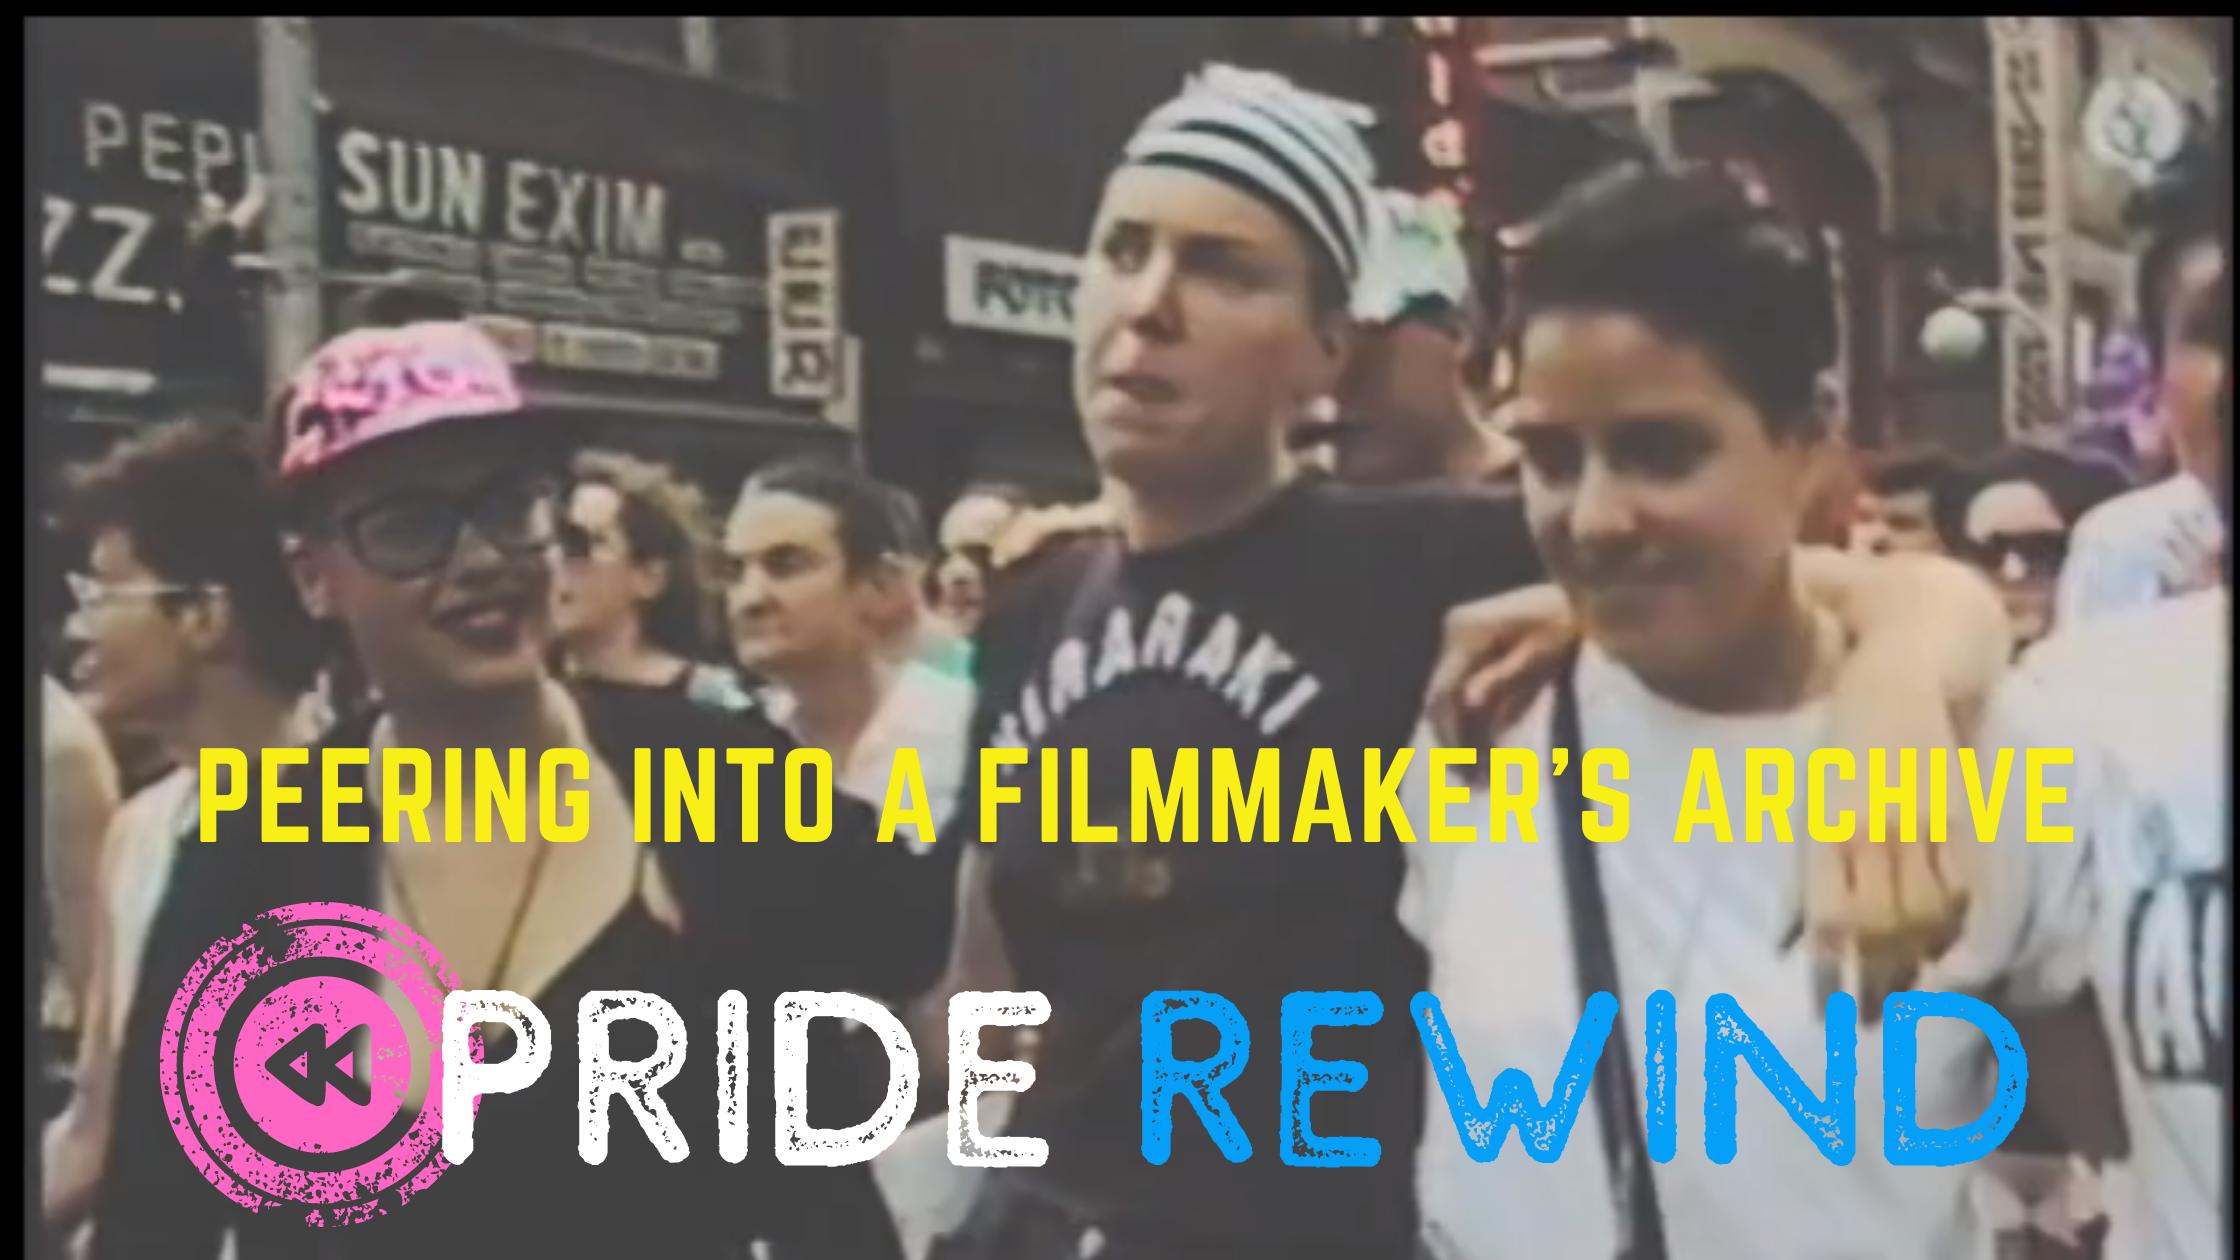 Aline Allegra Archival LGBT footage